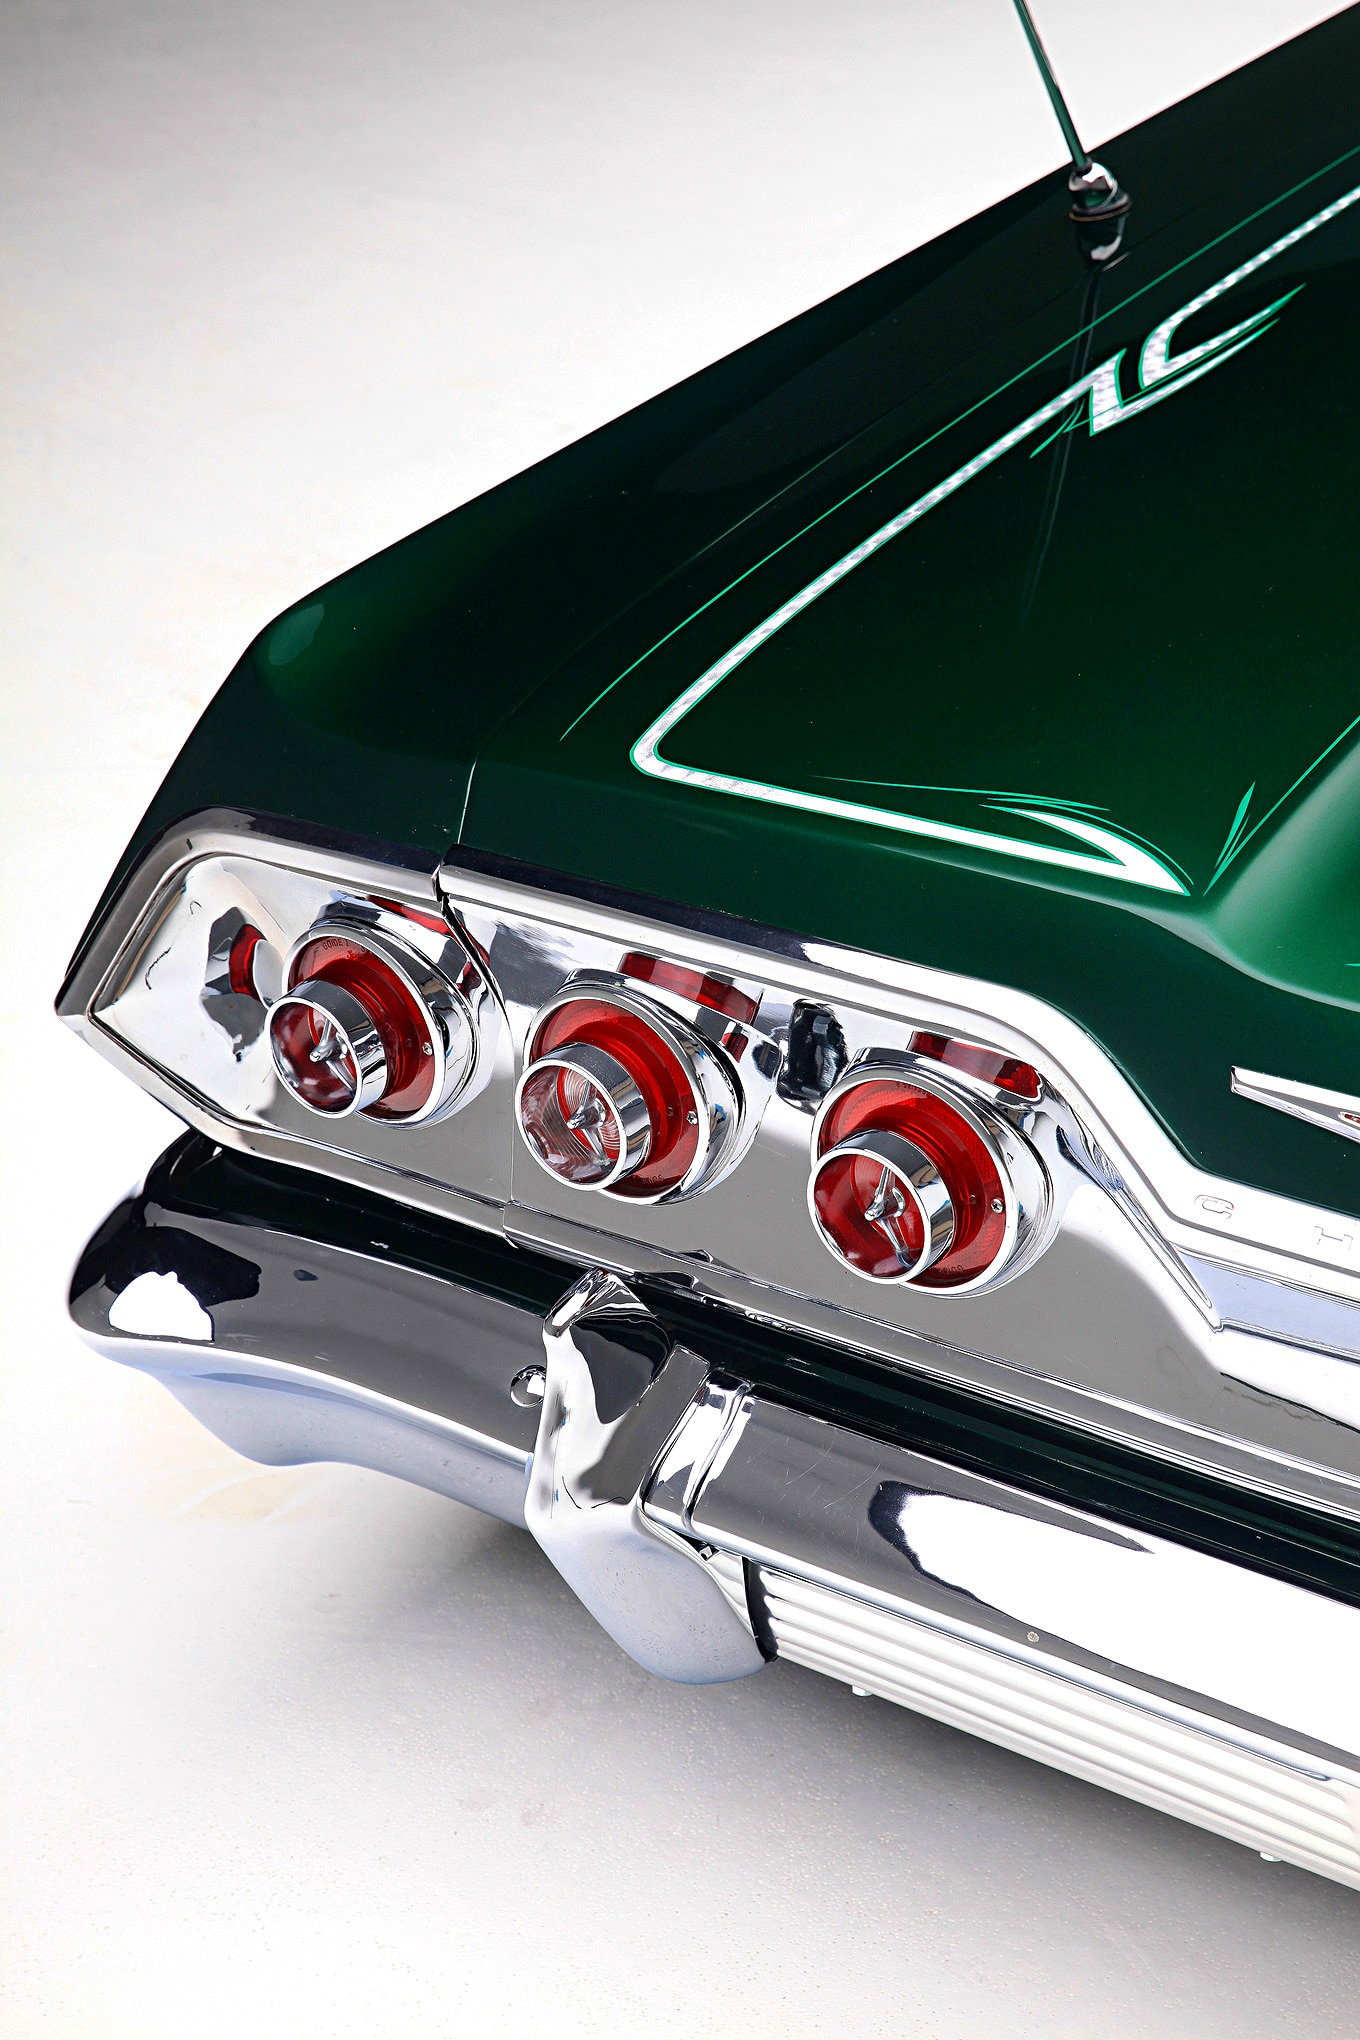 Restoring a 1963 Chevrolet Impala